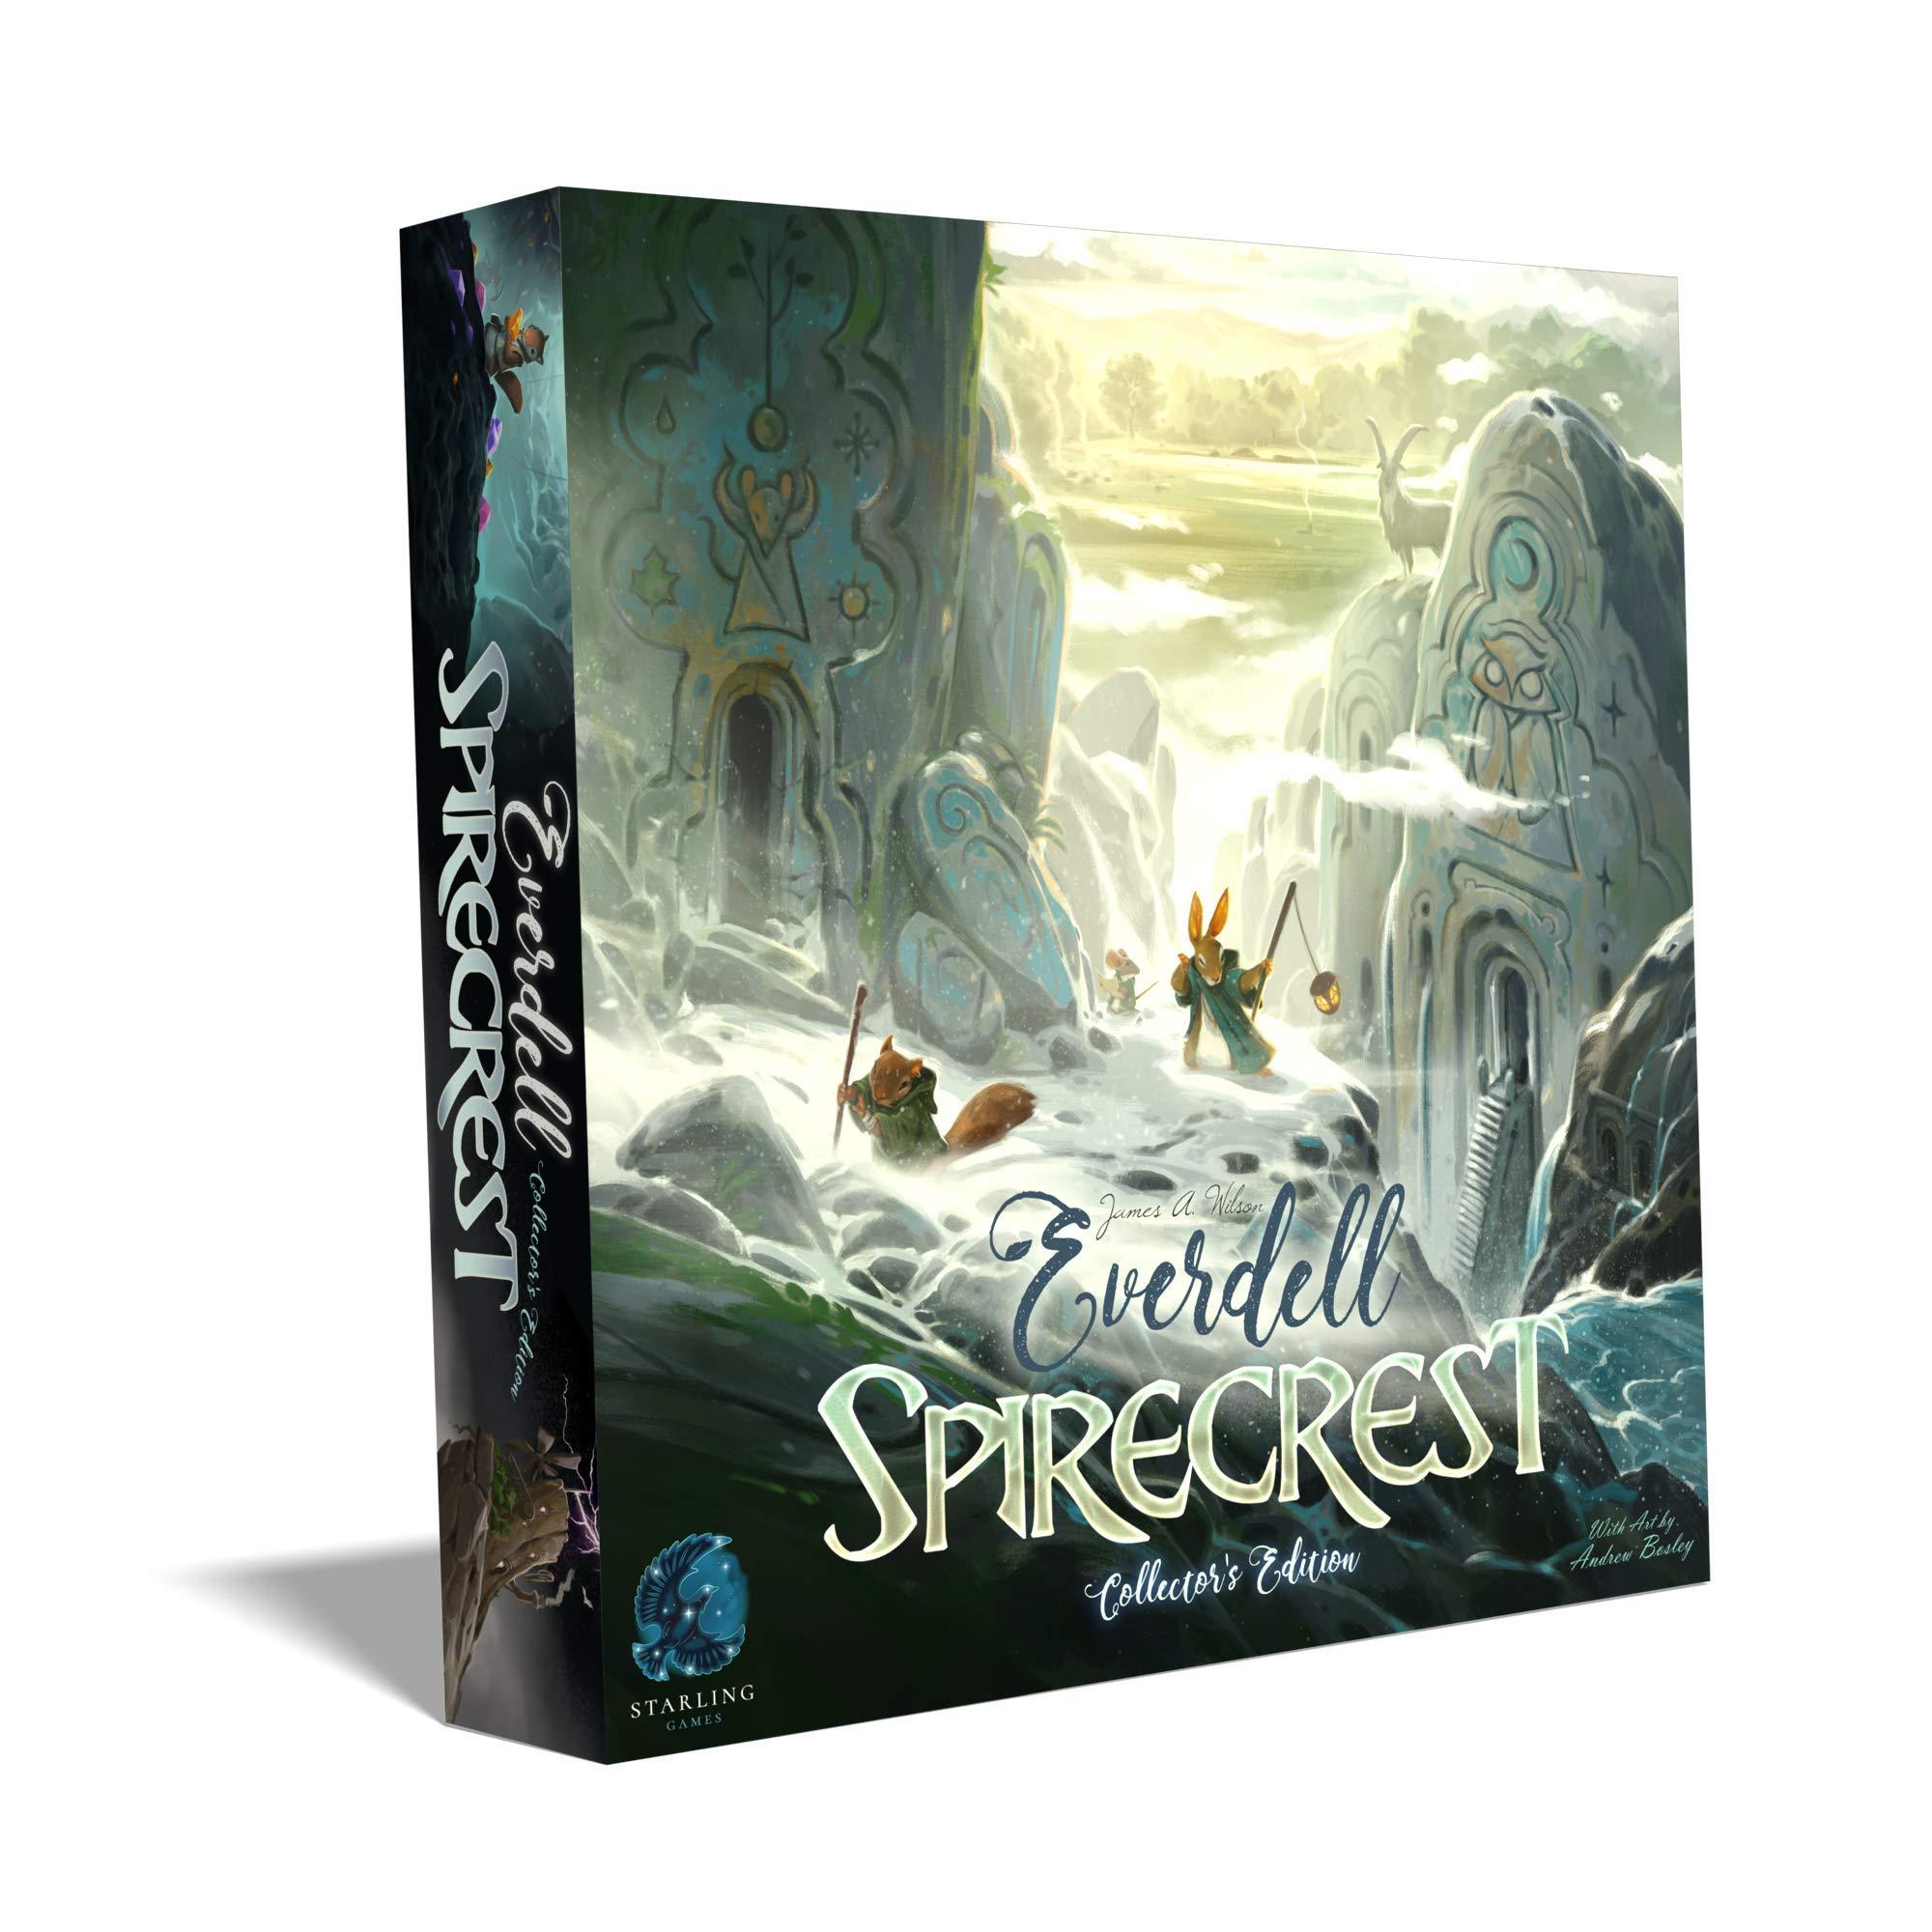 Everdell Spirecrest Collectors Edition